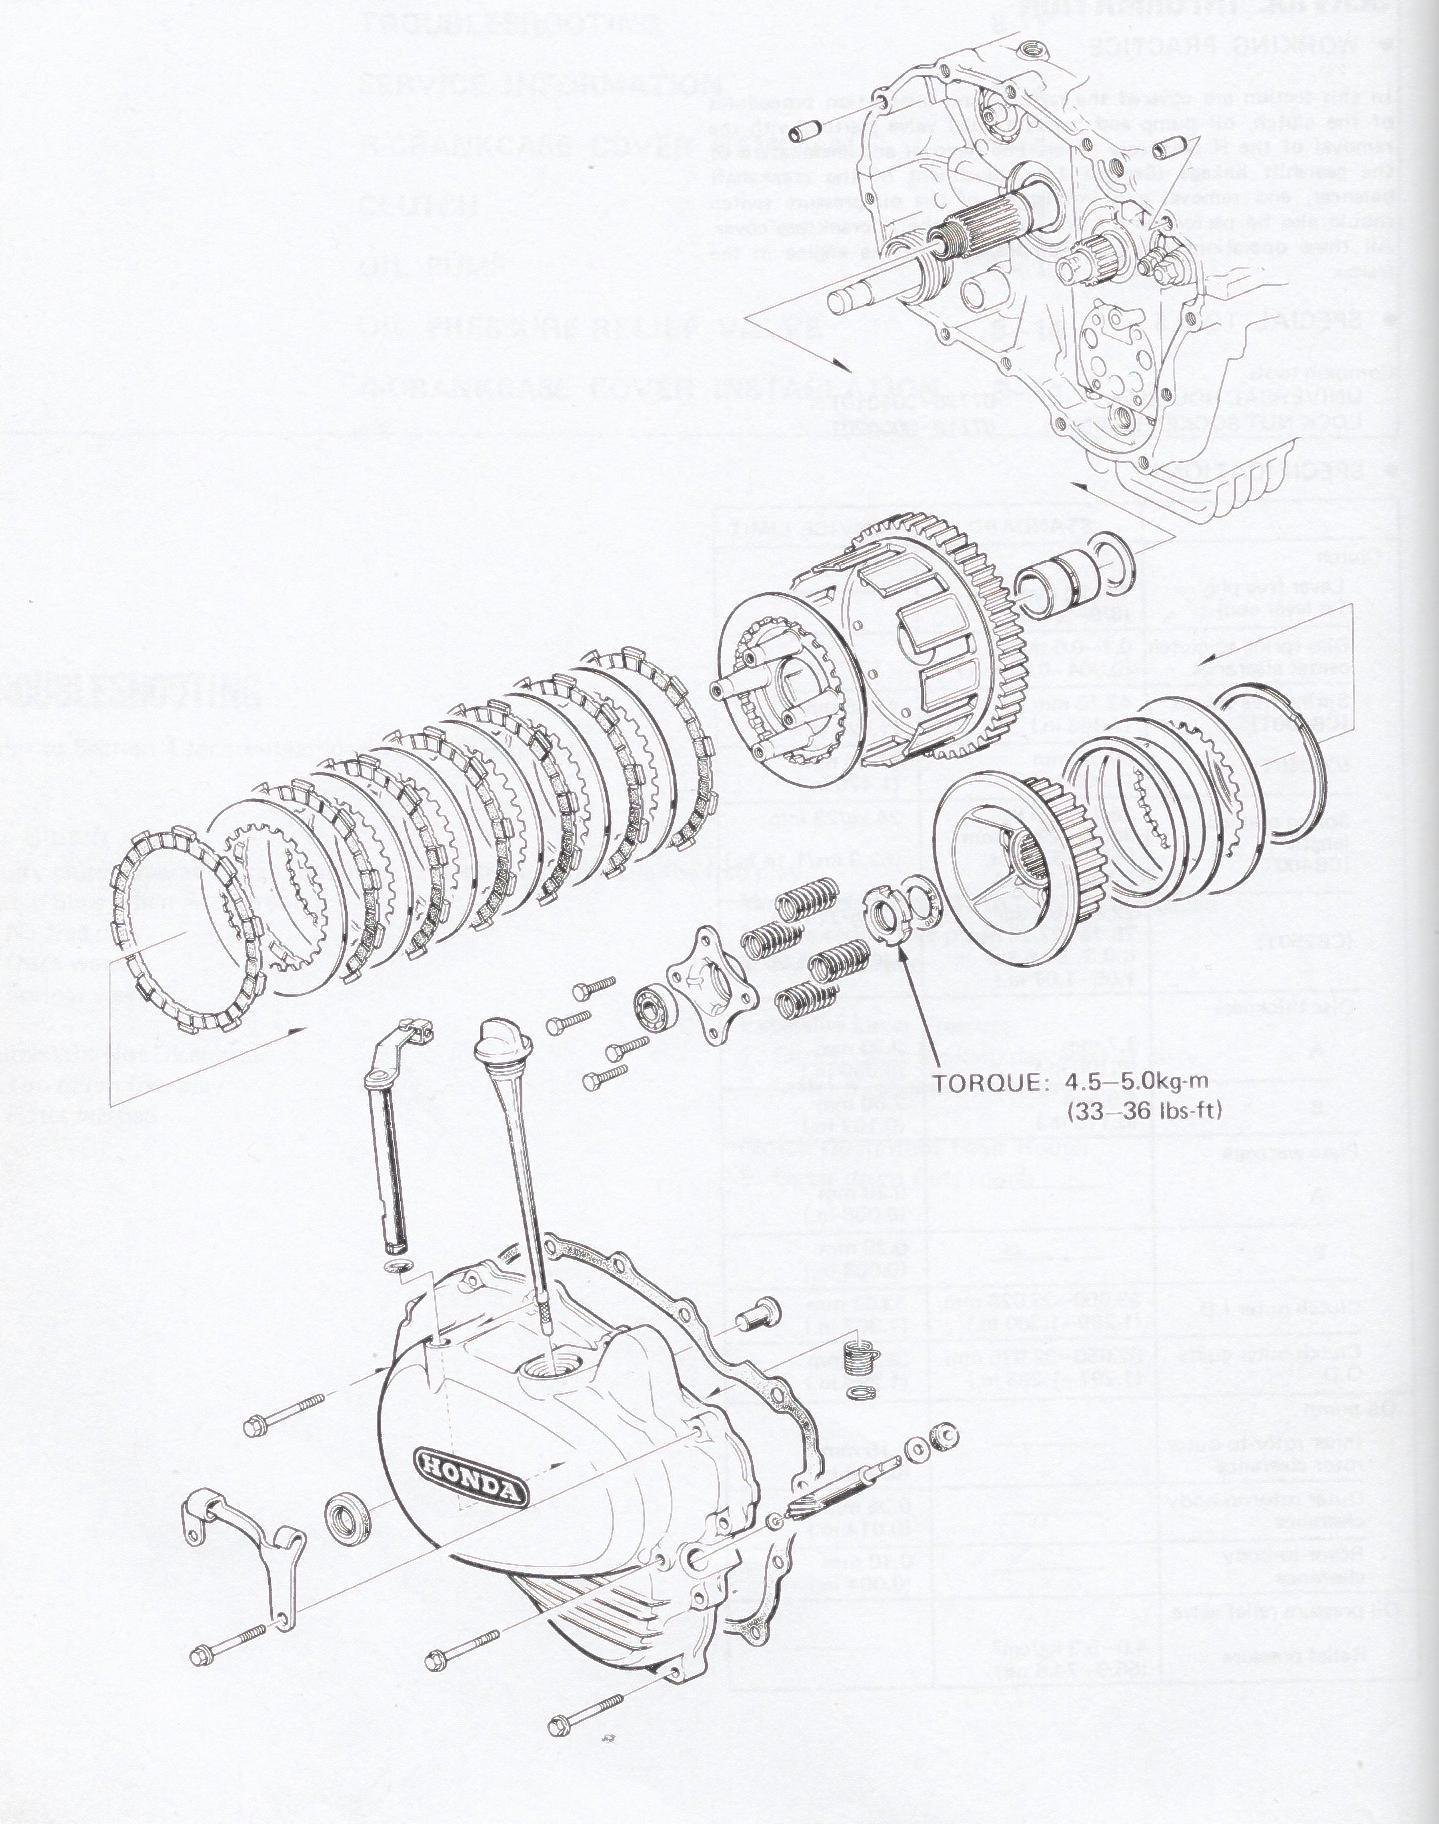 1979 honda cm400a wiring diagram basic electronics wiring diagram 1979 Honda Cb125s Wiring Diagram 1979 honda cm400a wiring diagram wiring diagram database